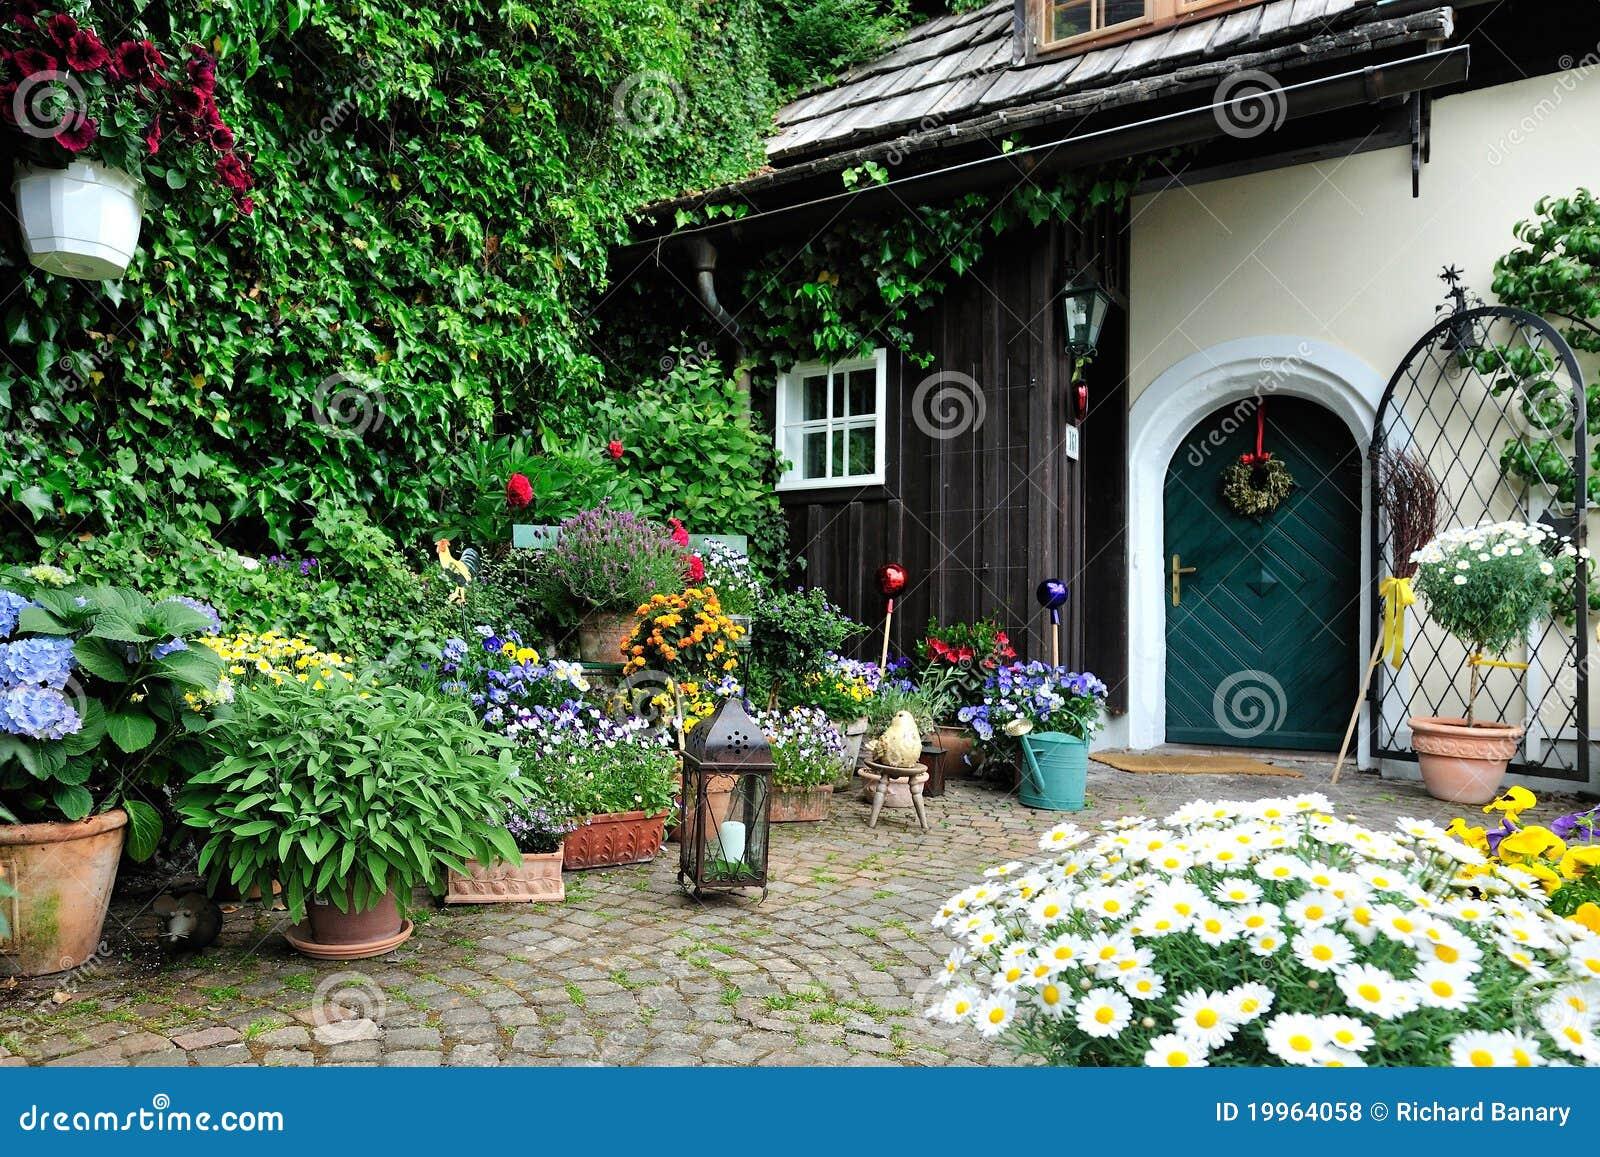 fotos jardim pequeno : fotos jardim pequeno:Fotos de Stock Royalty Free: Jardim pequeno cénico